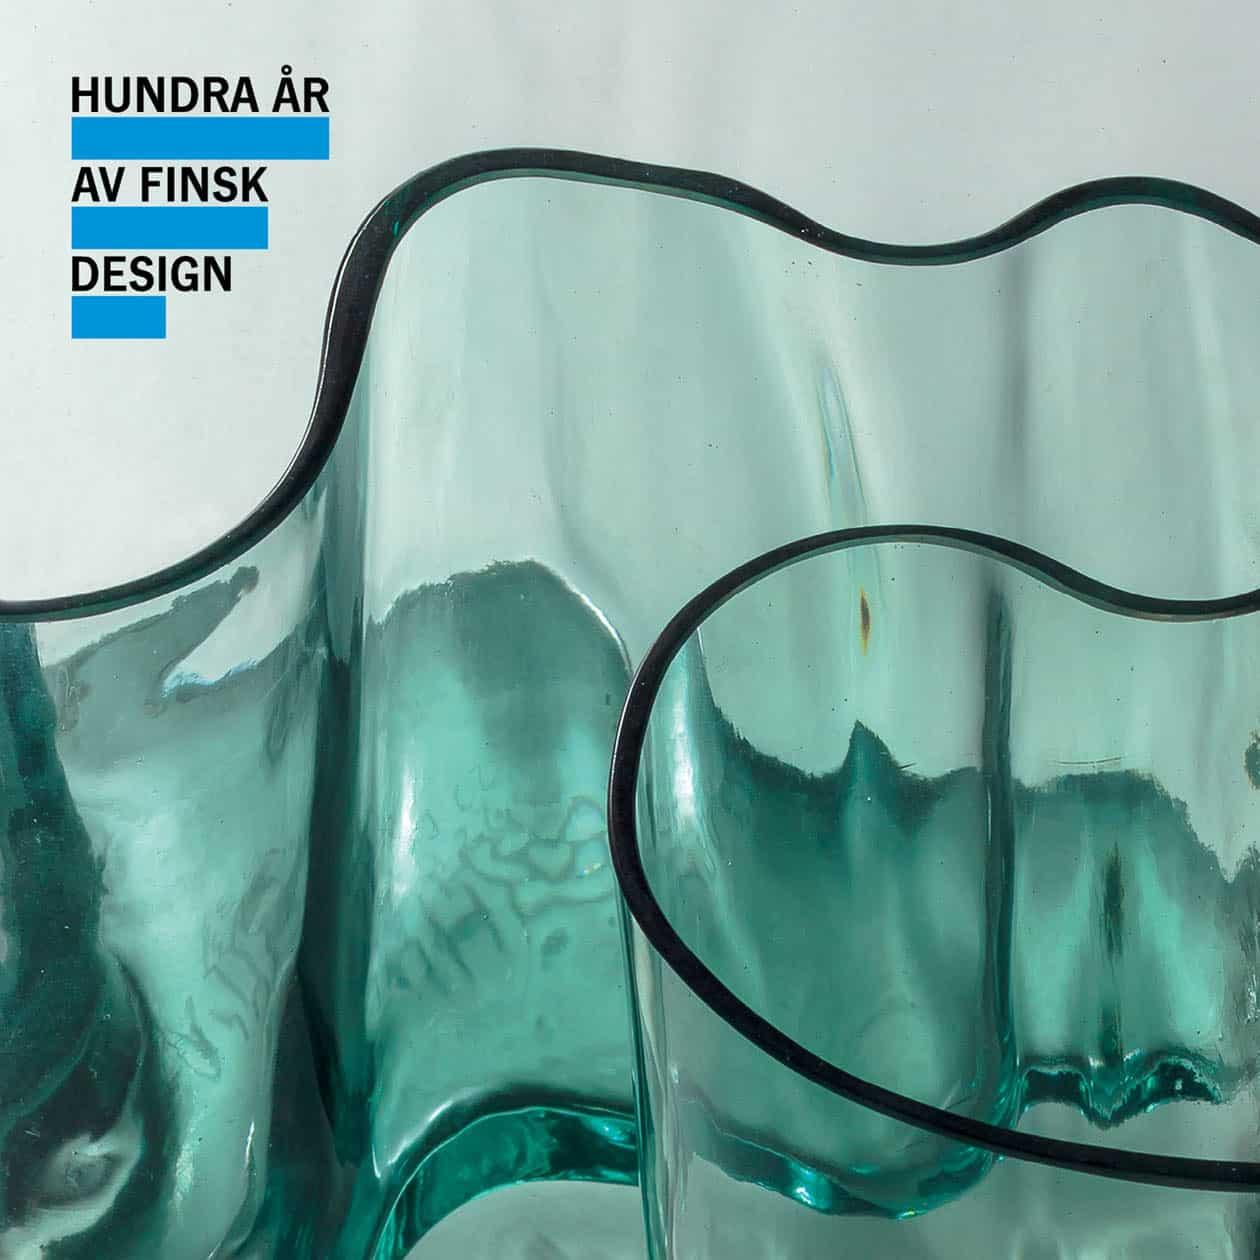 Hundred Years of Finnish Design